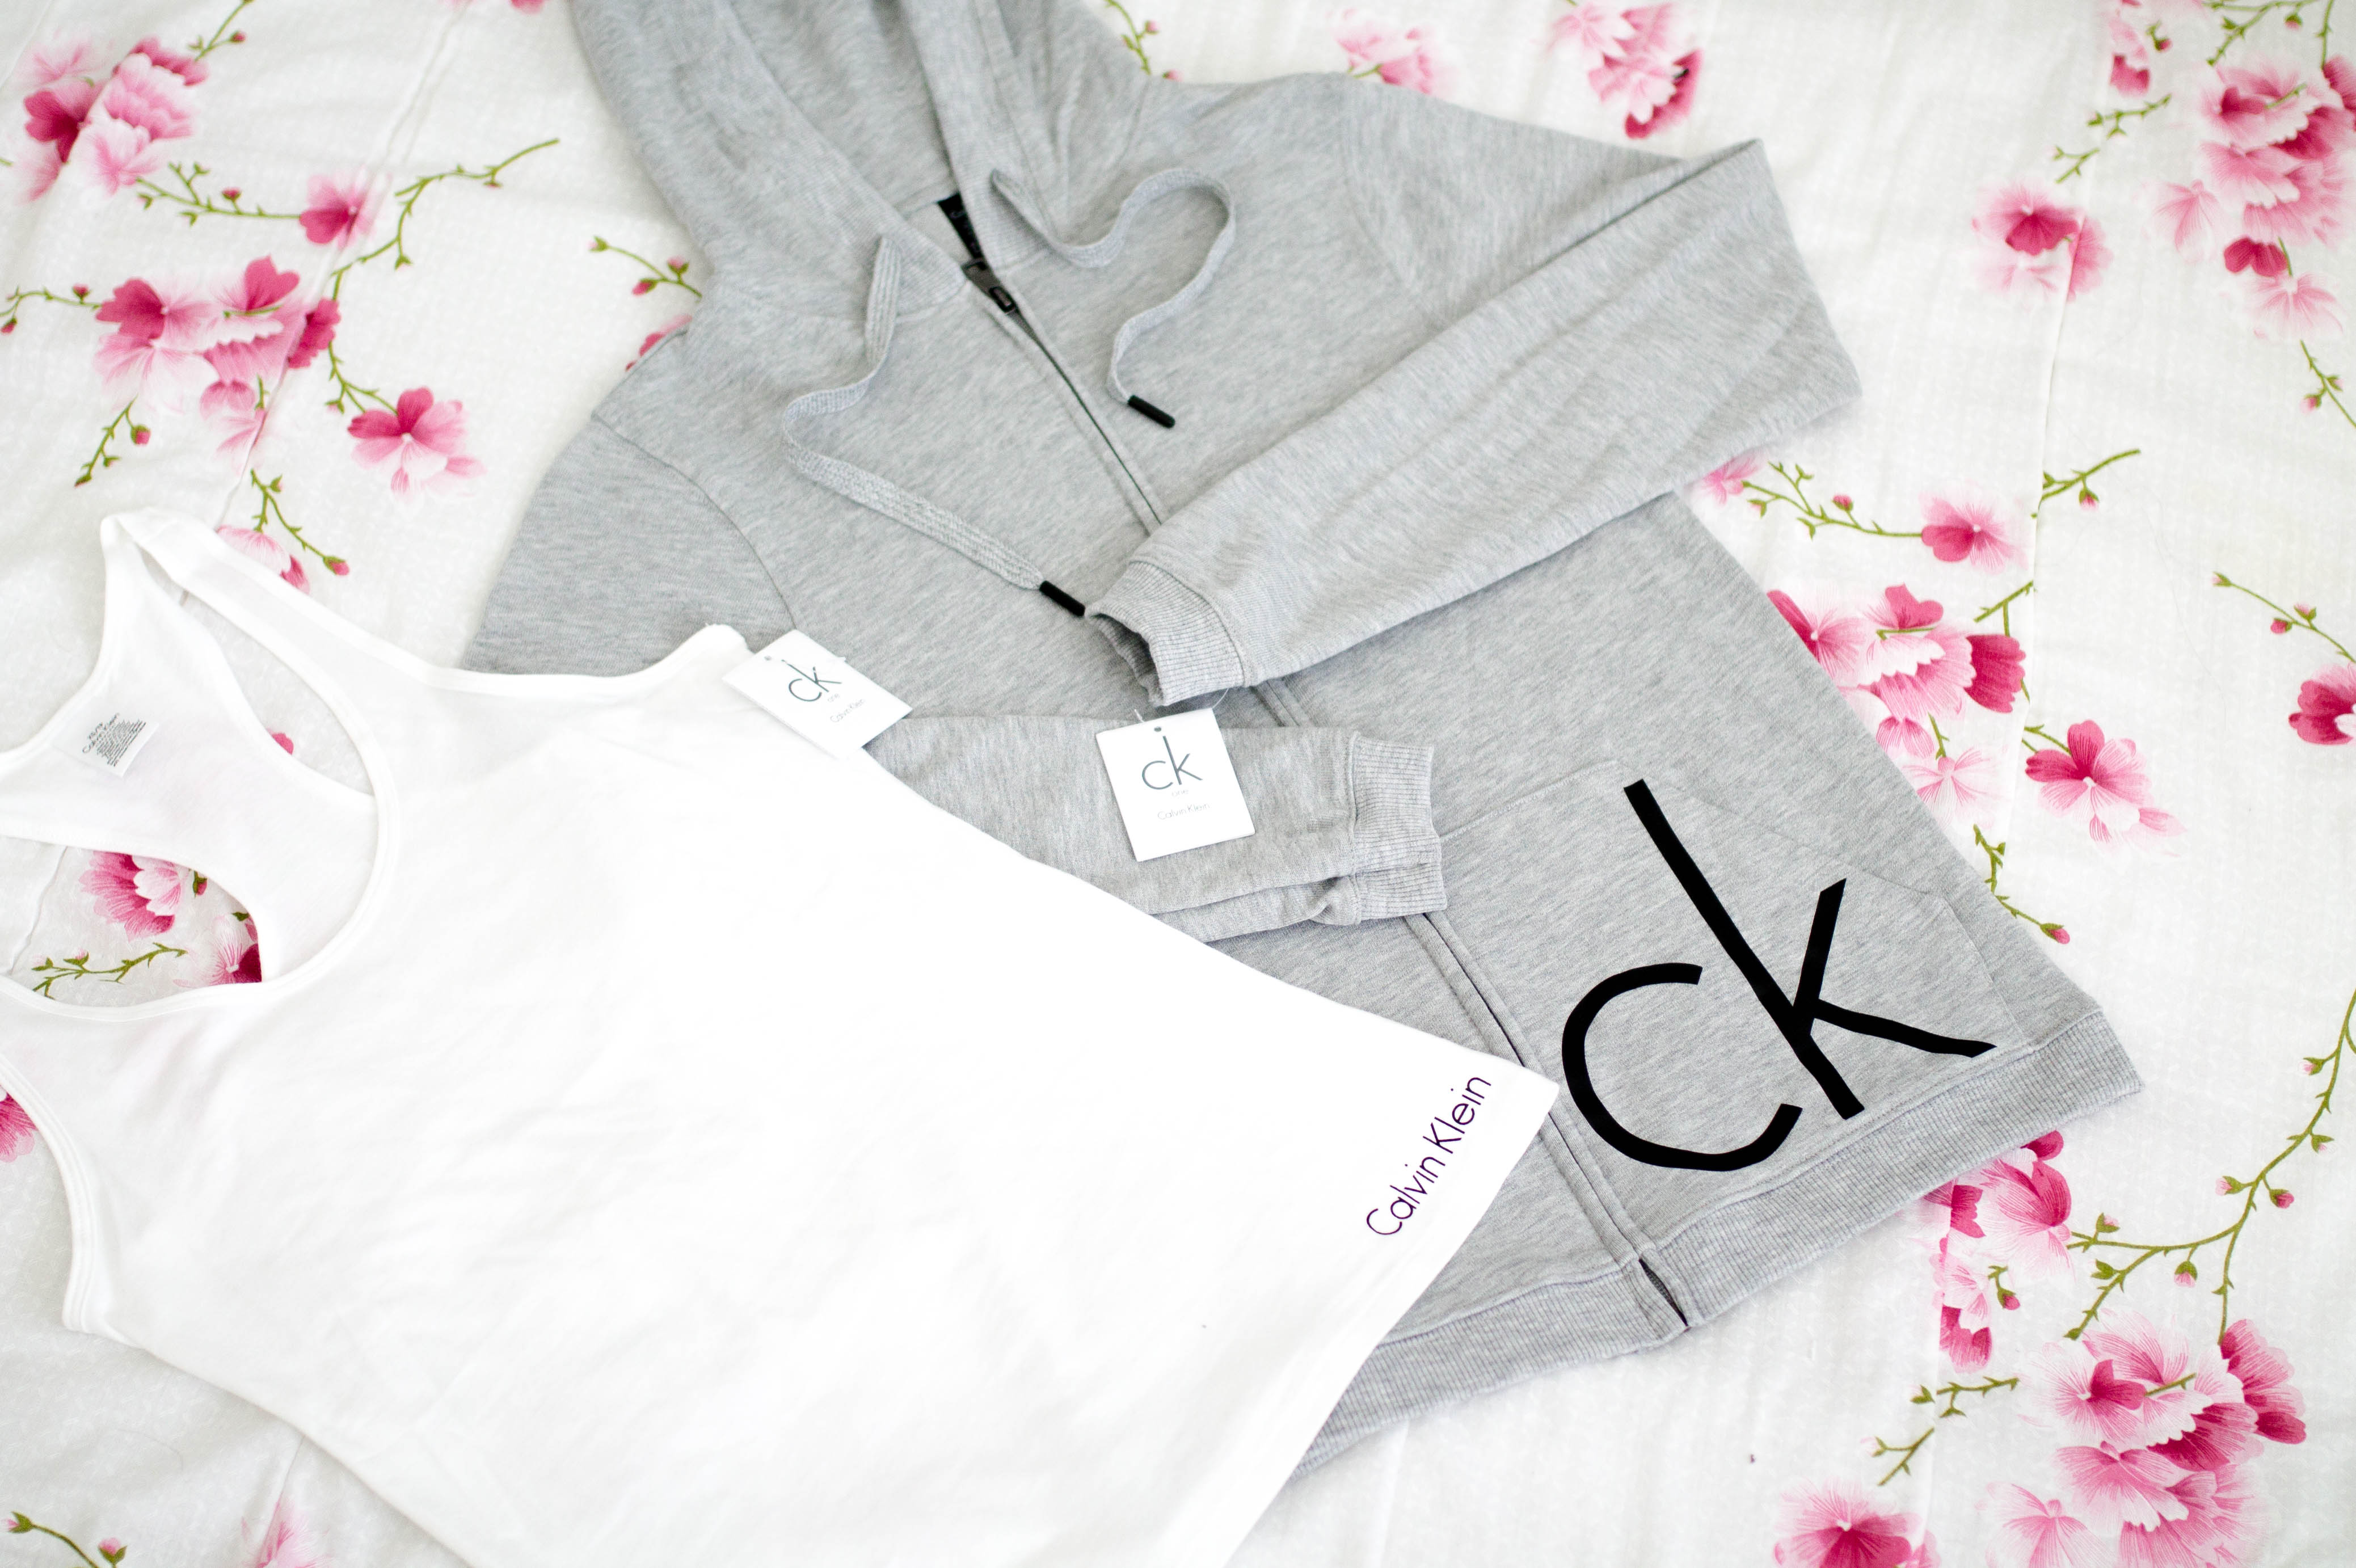 calvin klein vaatteet